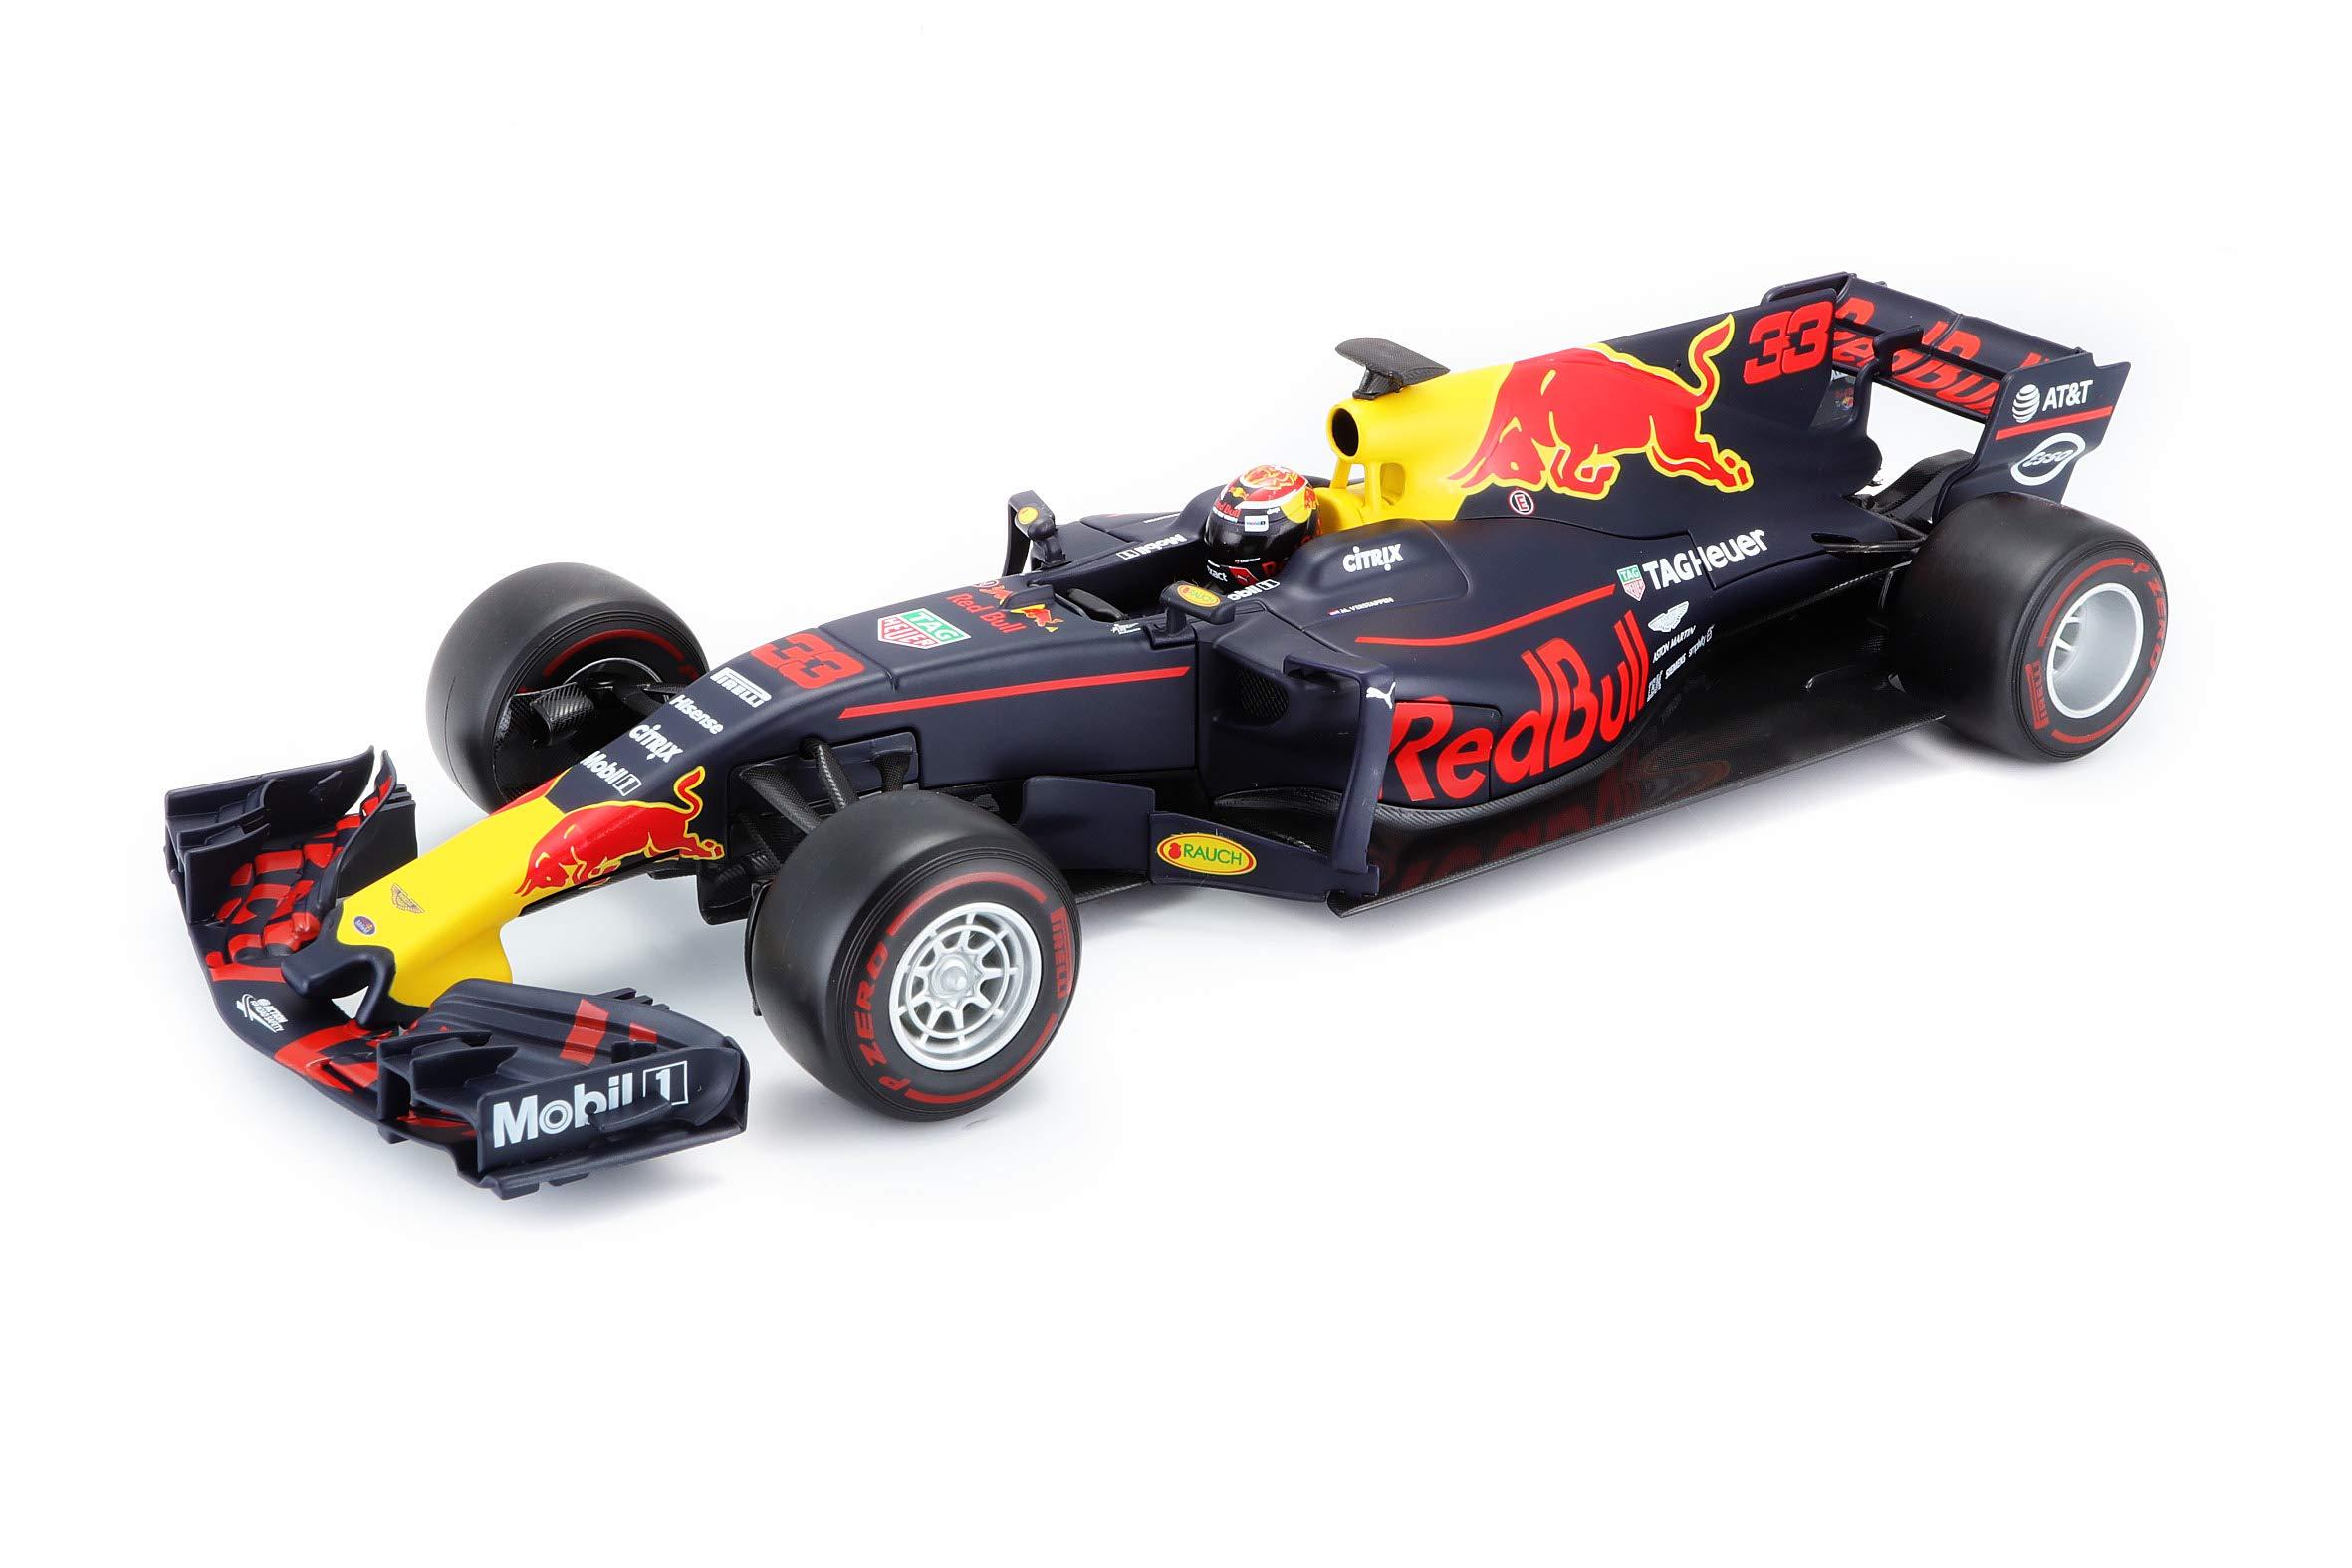 Bburago 1:18 Red Bull Racing Tag Heuer RB13 (2017 Max Verstappen/Daniel Ricciardo Model), Blue